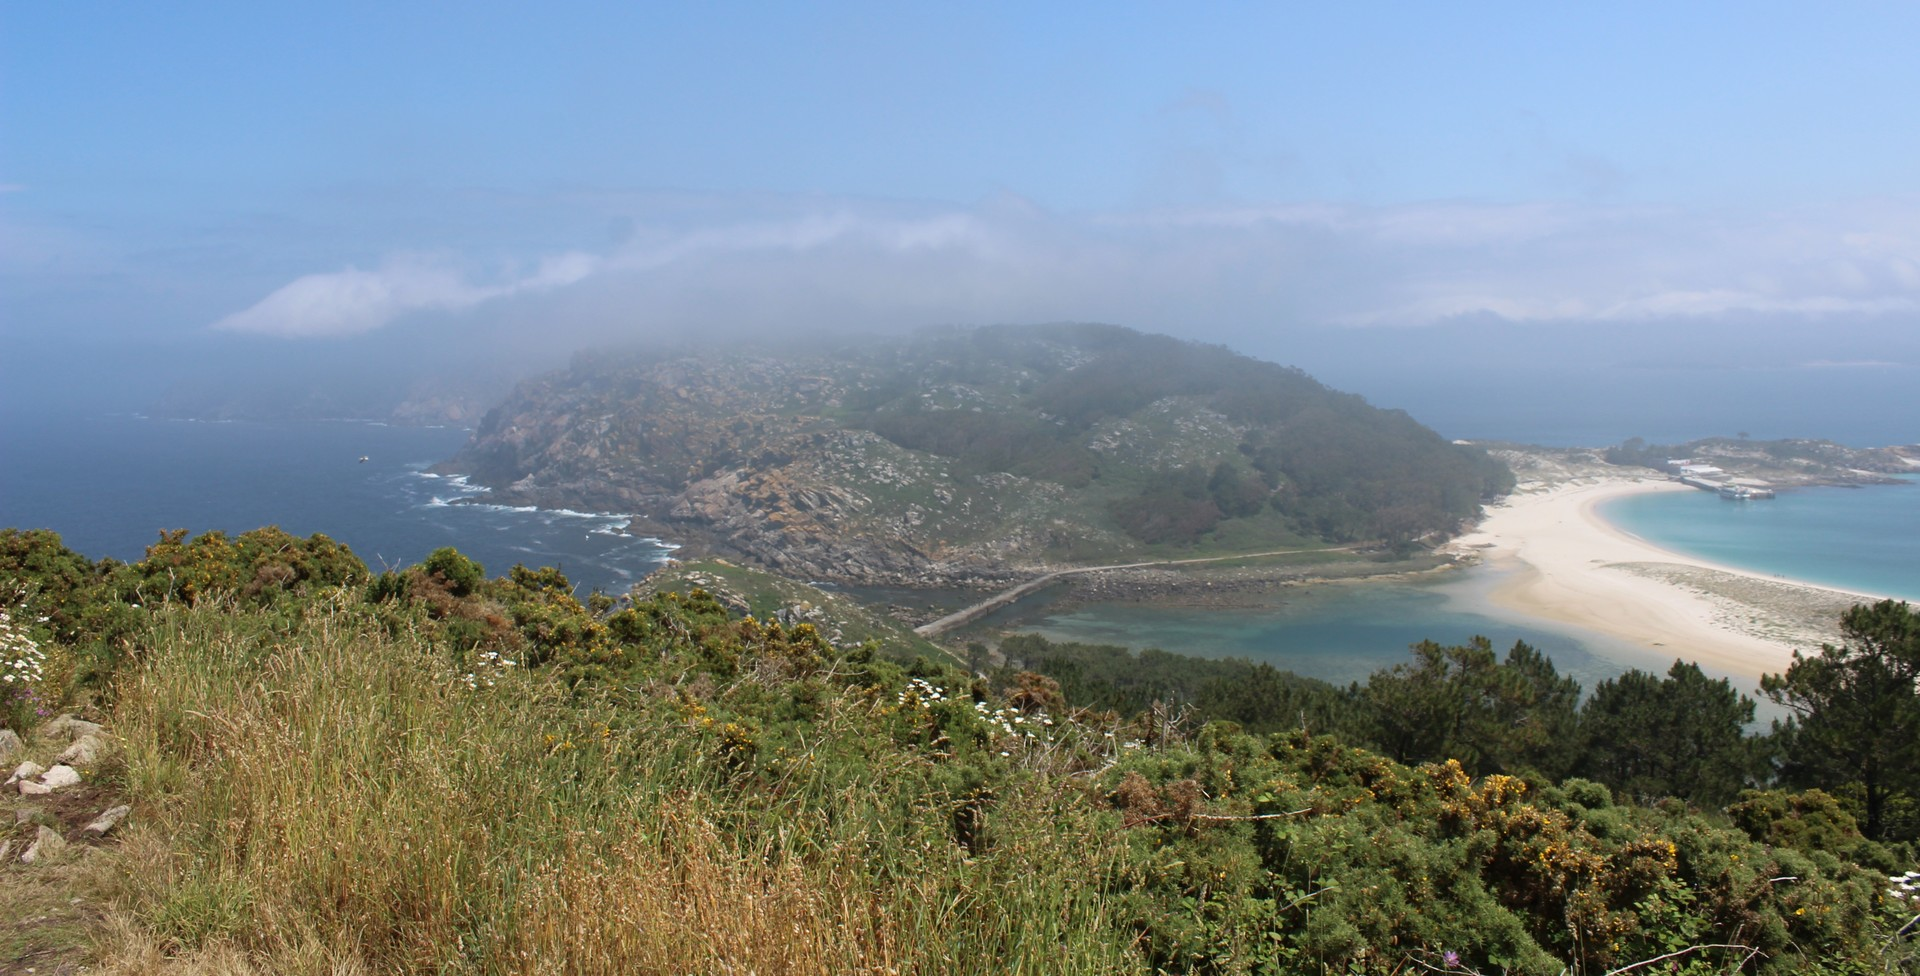 islas-ci-ruta-monte-faro-950167891c345b2